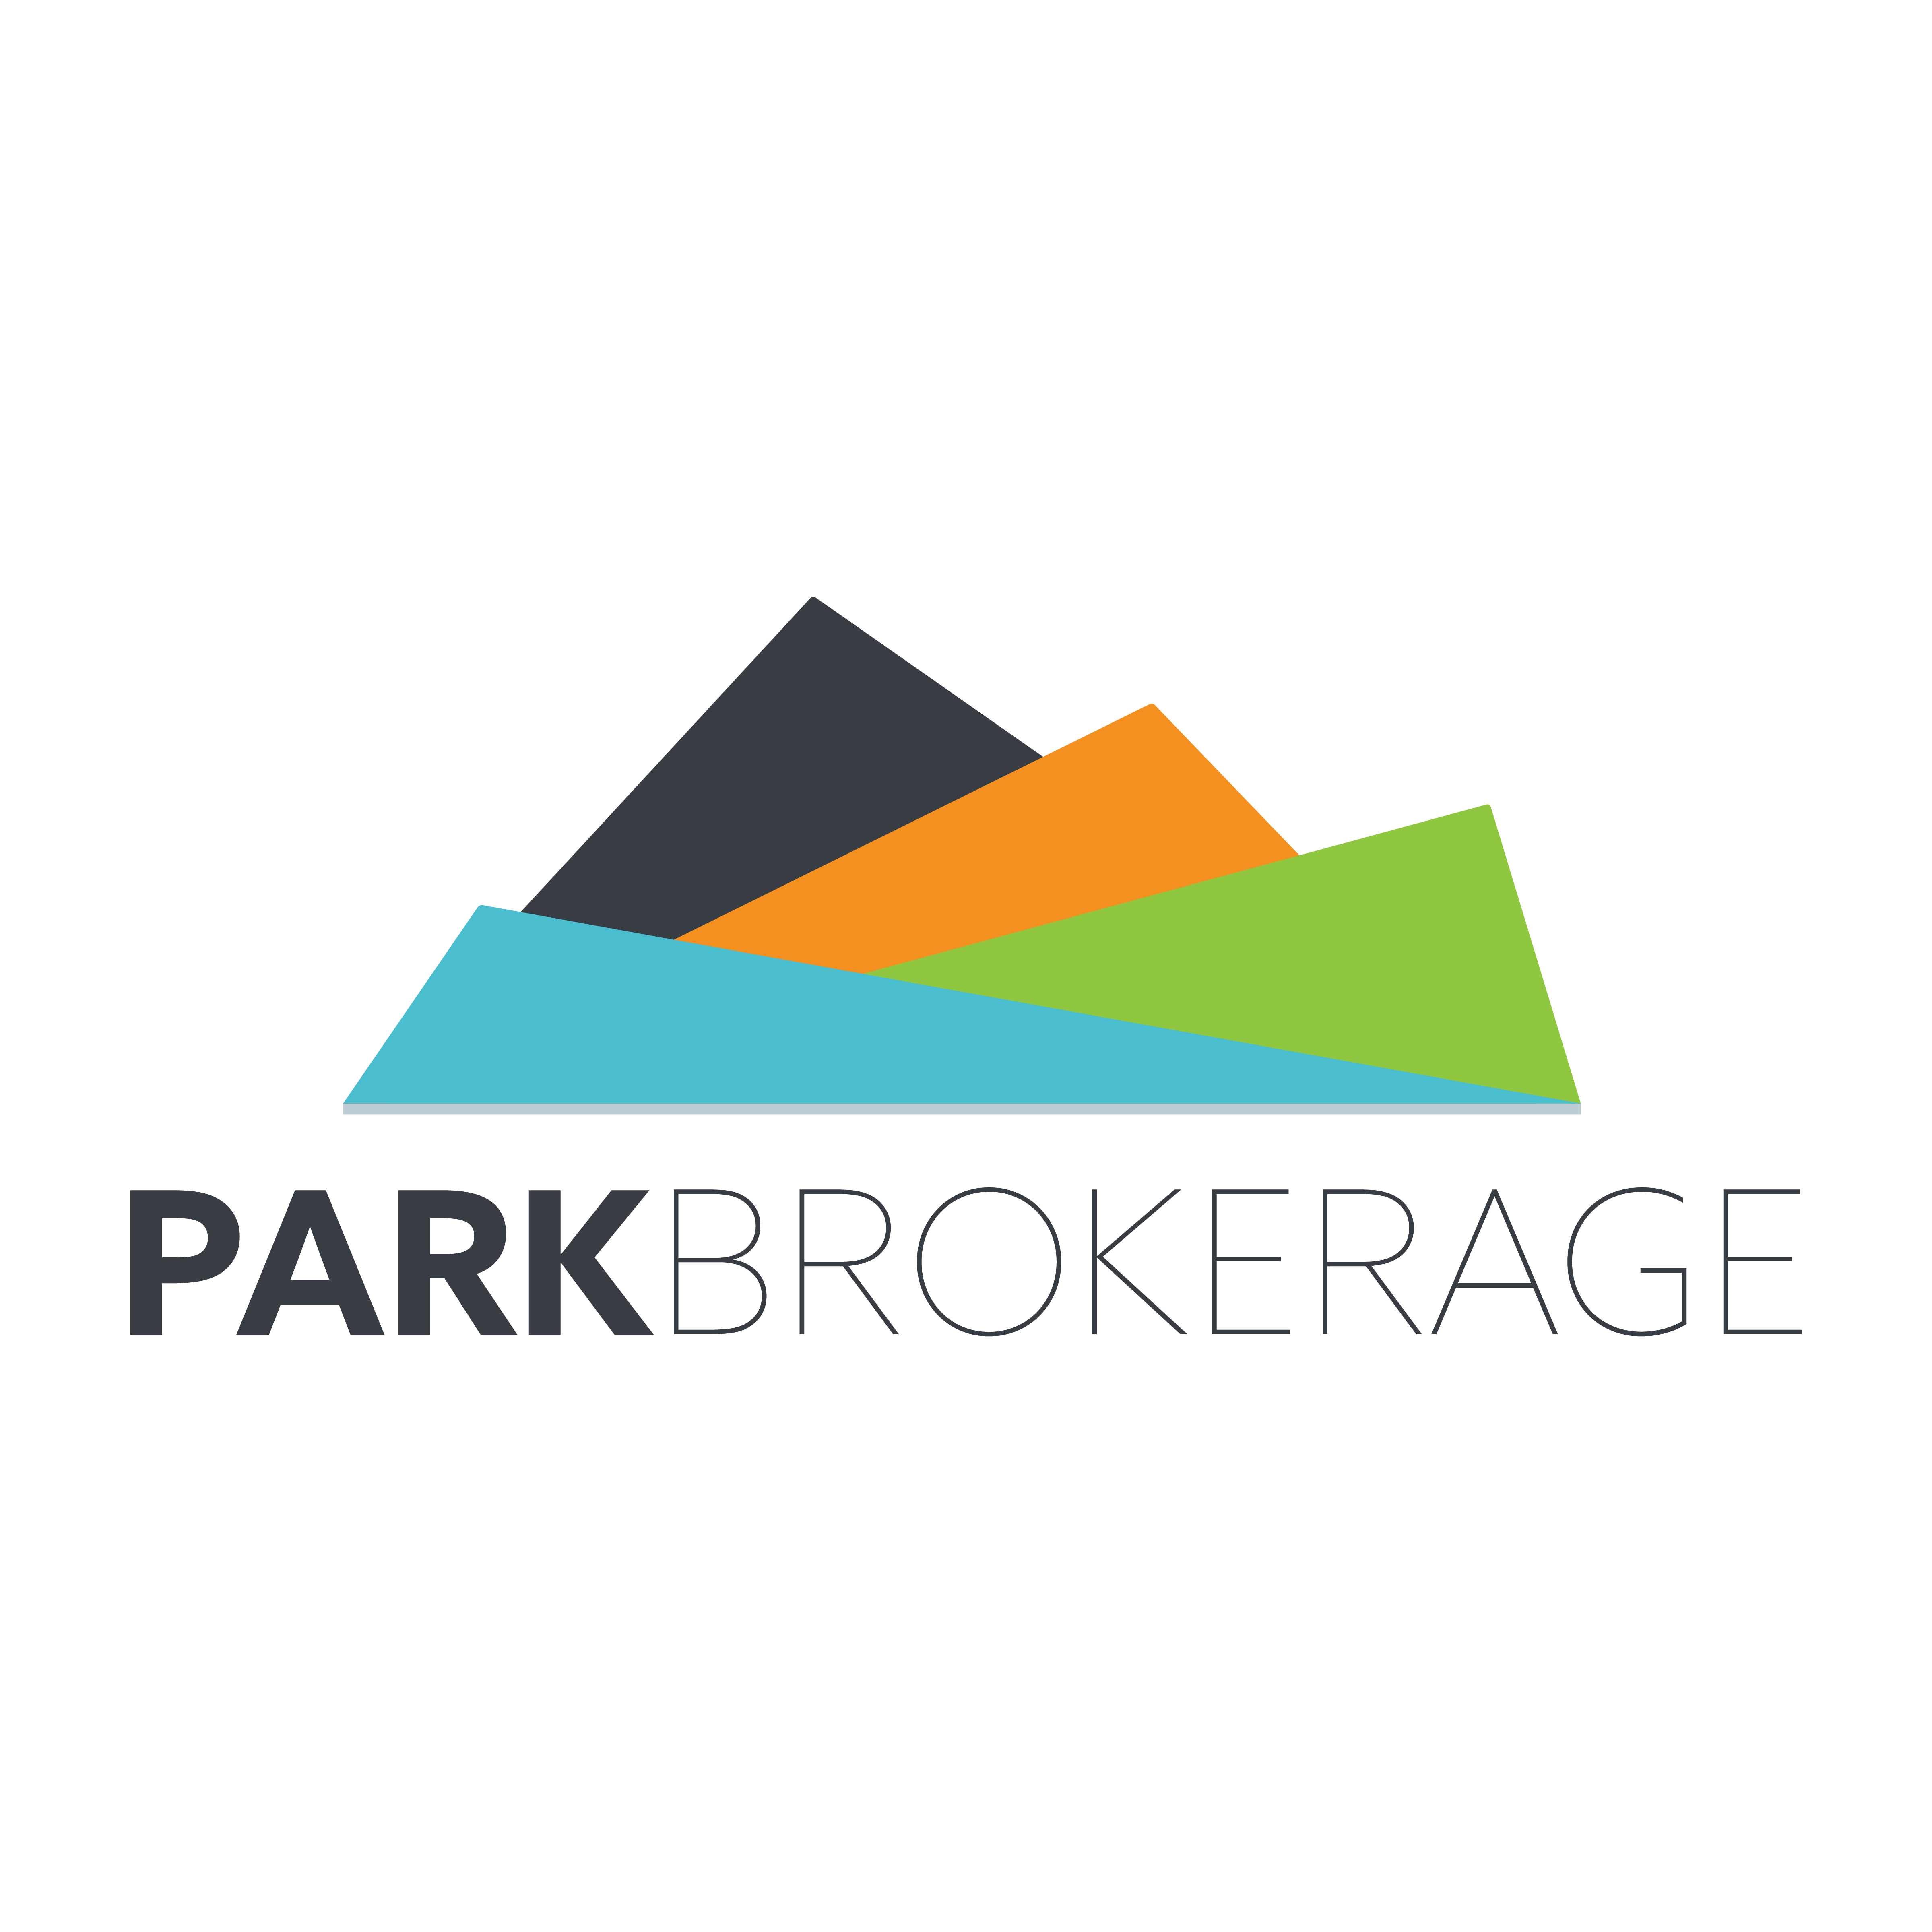 Park Brokerage